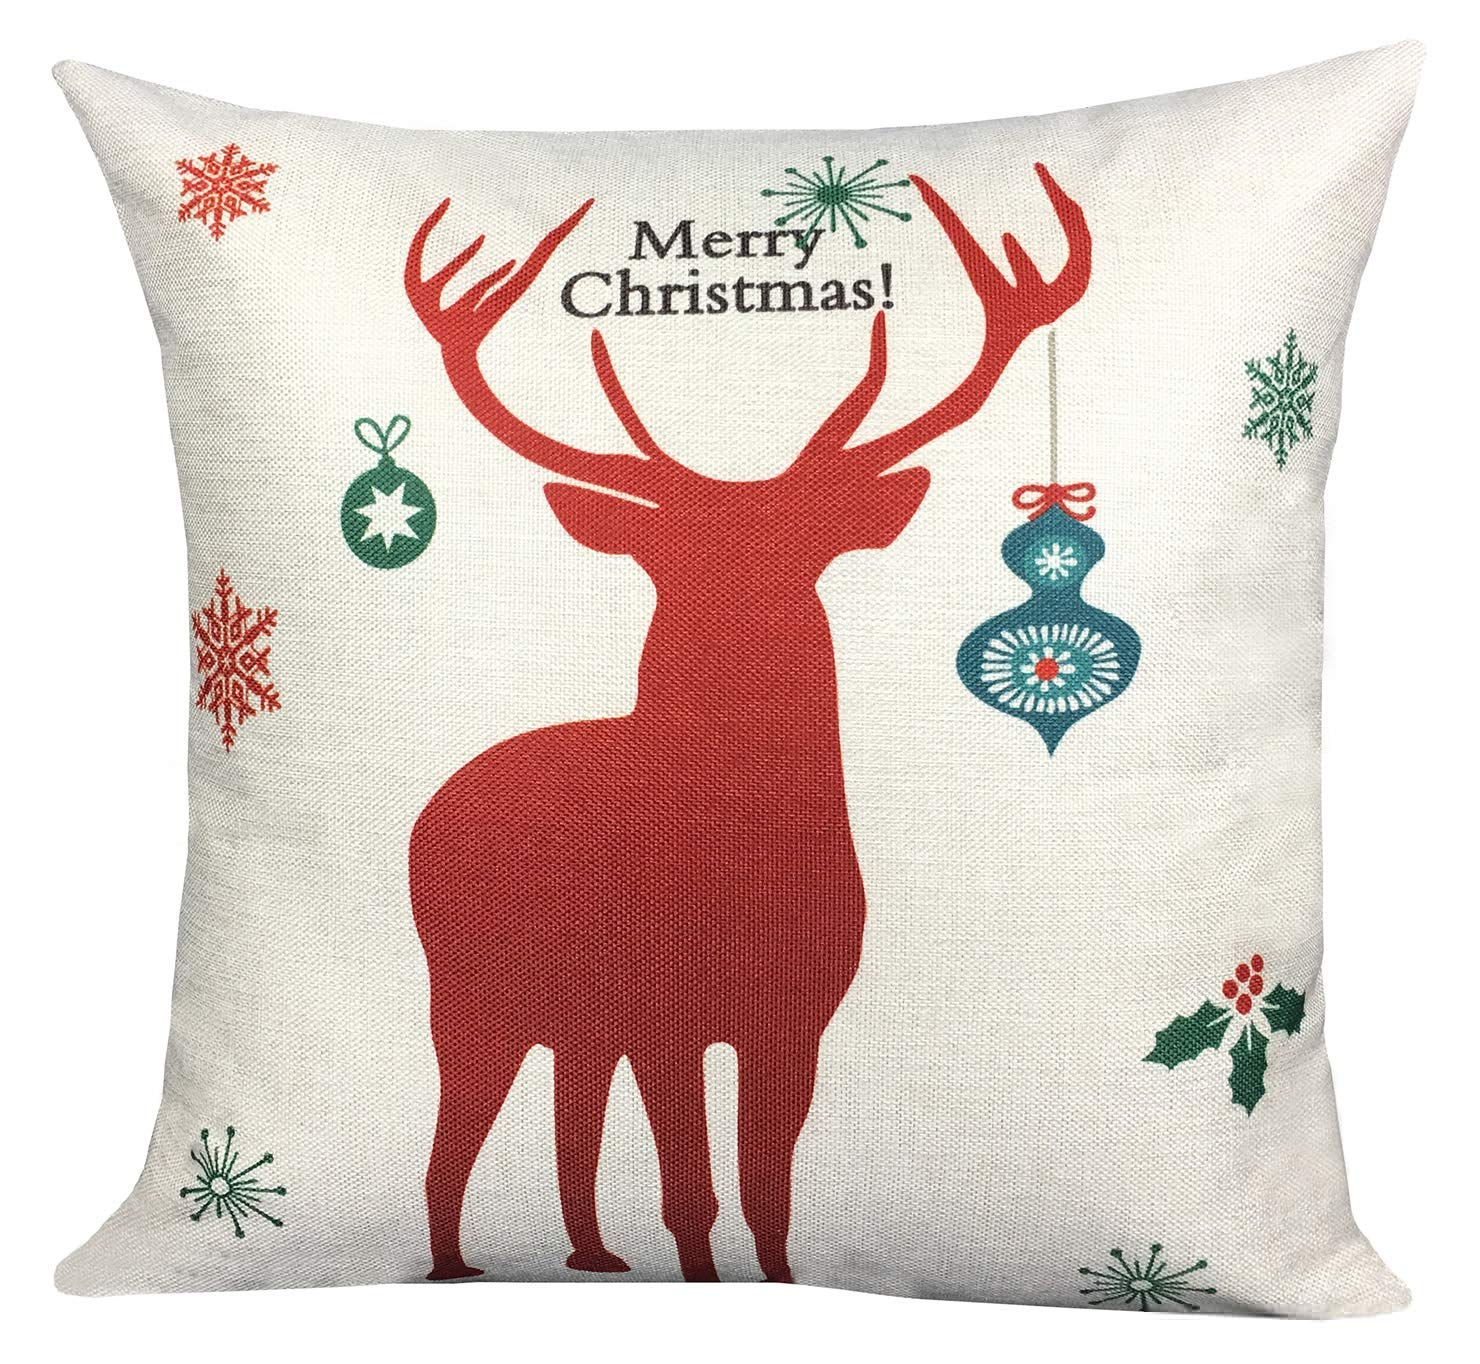 ArtKisser Christmas Pillows Covers 18 X 18 Christmas Decor Tree Pillow Covers Christmas Decorative Throw Pillow Case Sofa Home Decor